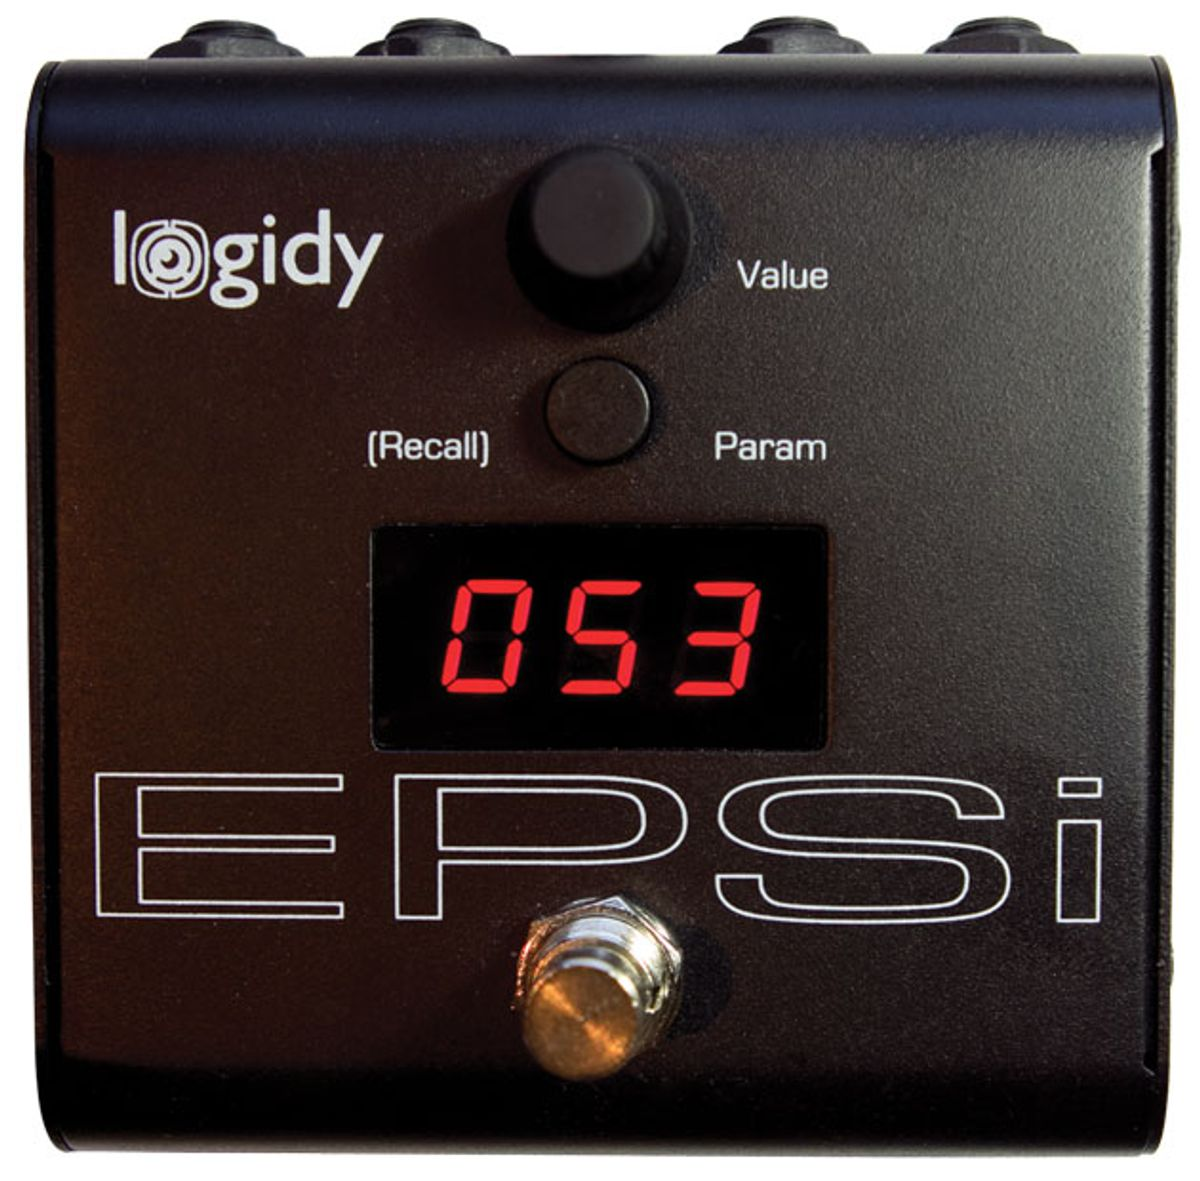 Logidy EPSi Review